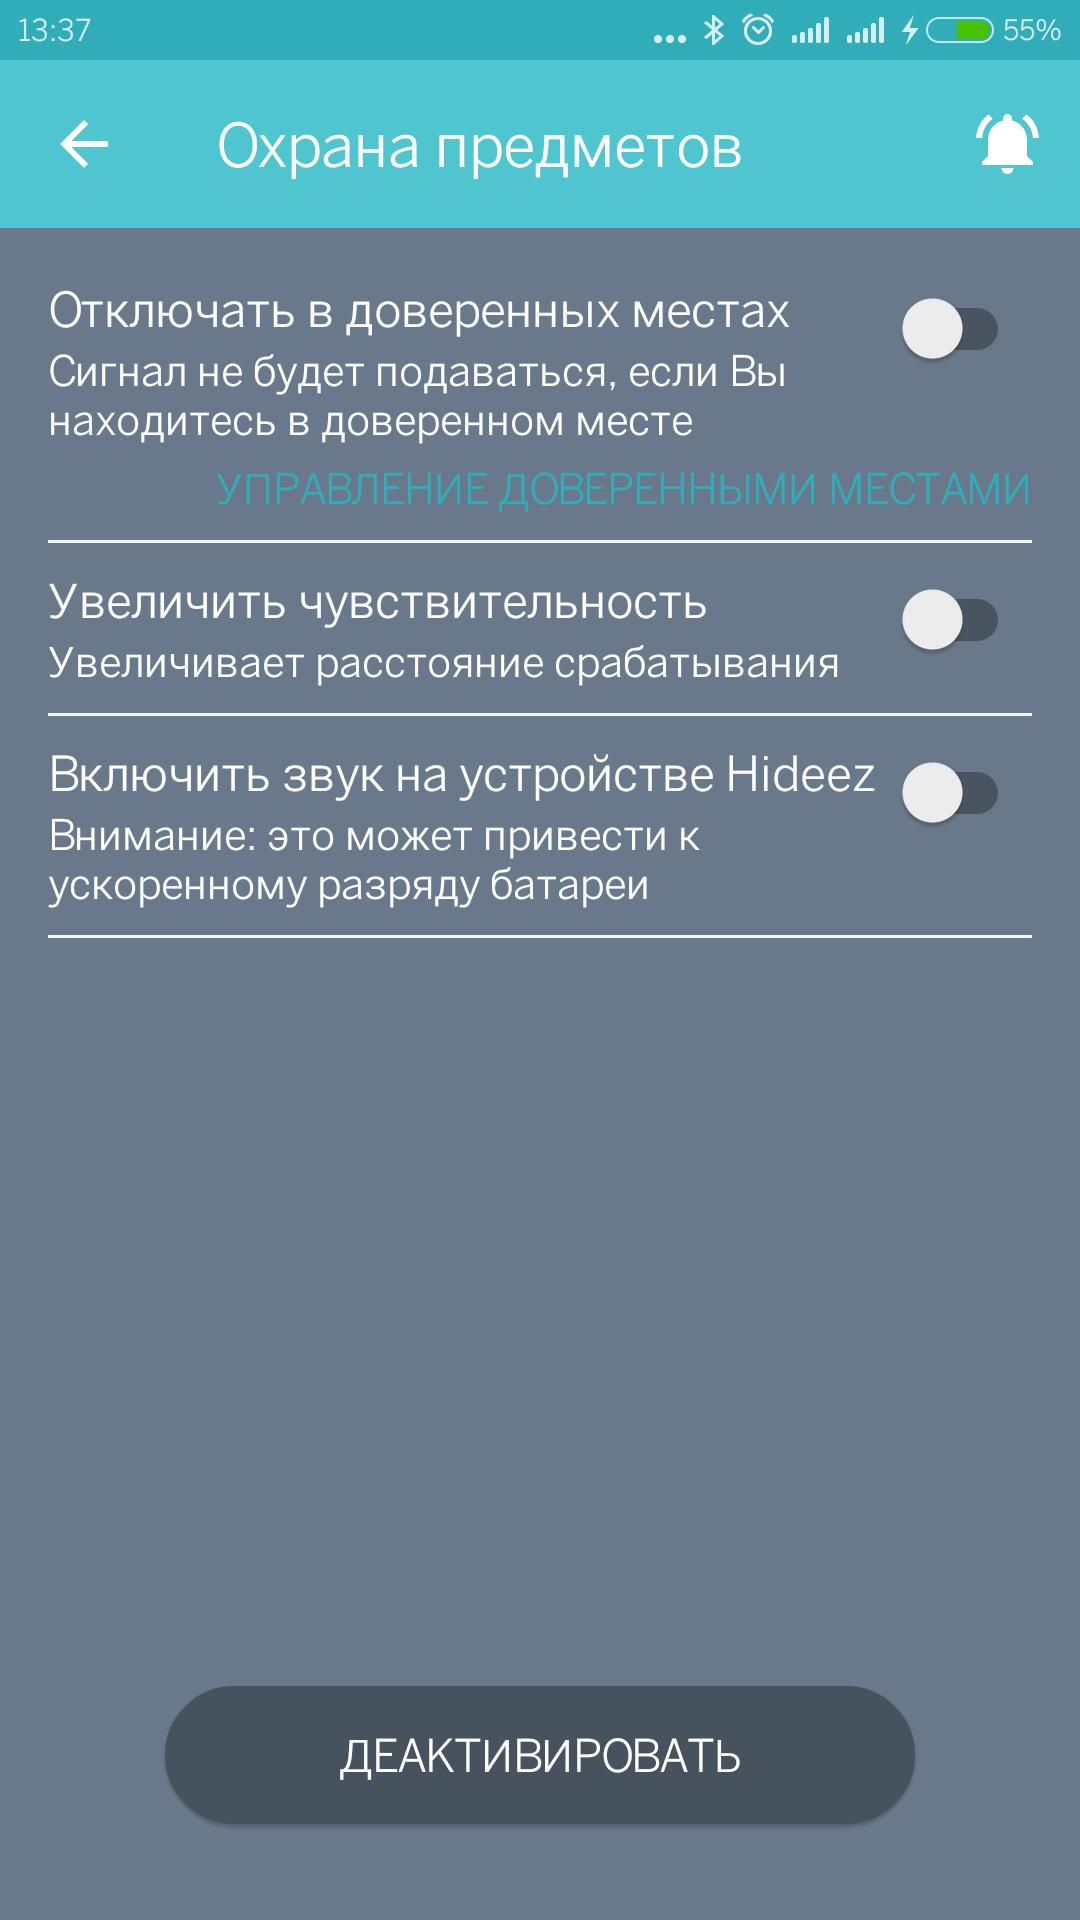 screenshot_2017-07-18-13-37-37